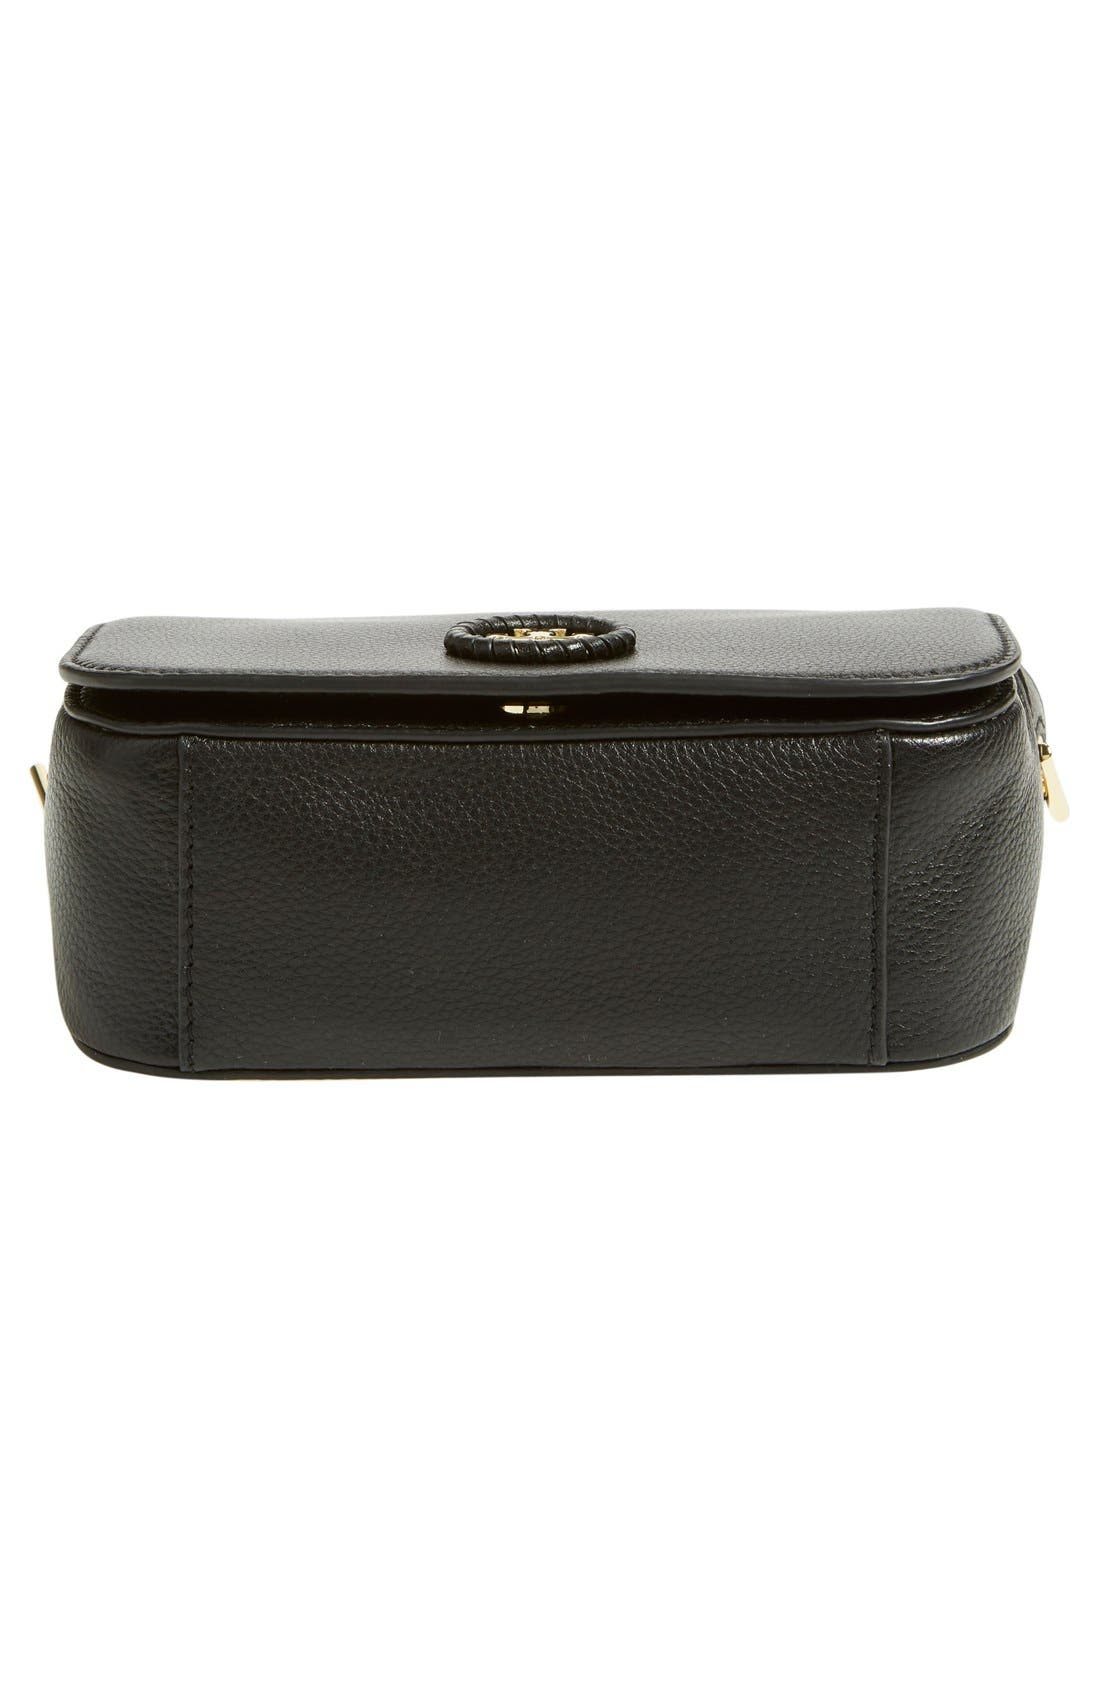 TORY BURCH, Mini Leather Crossbody Bag, Alternate thumbnail 4, color, 001